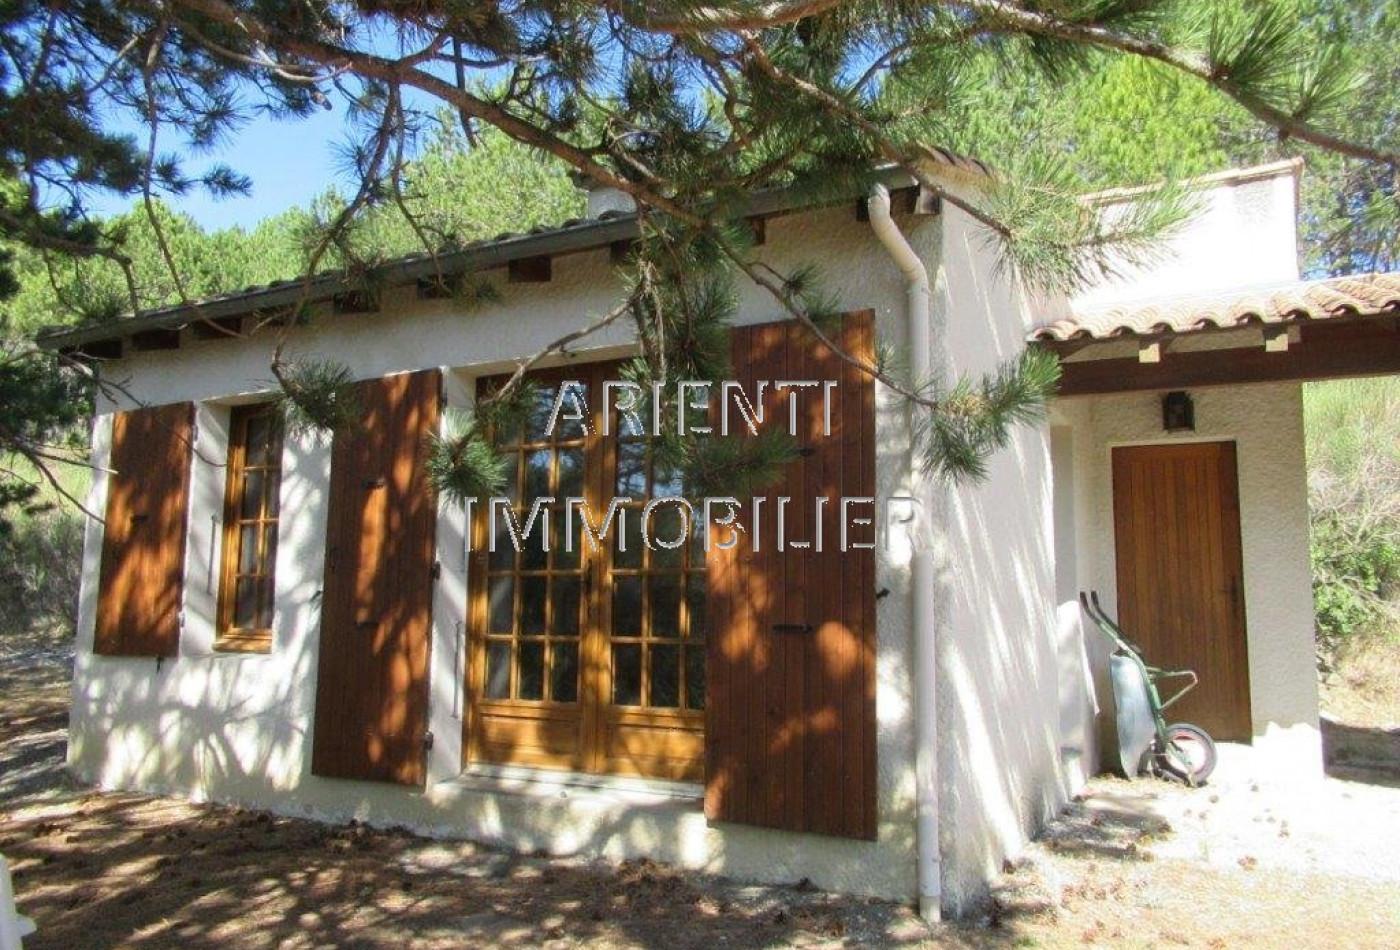 A vendre Dieulefit 2600173 Office immobilier arienti